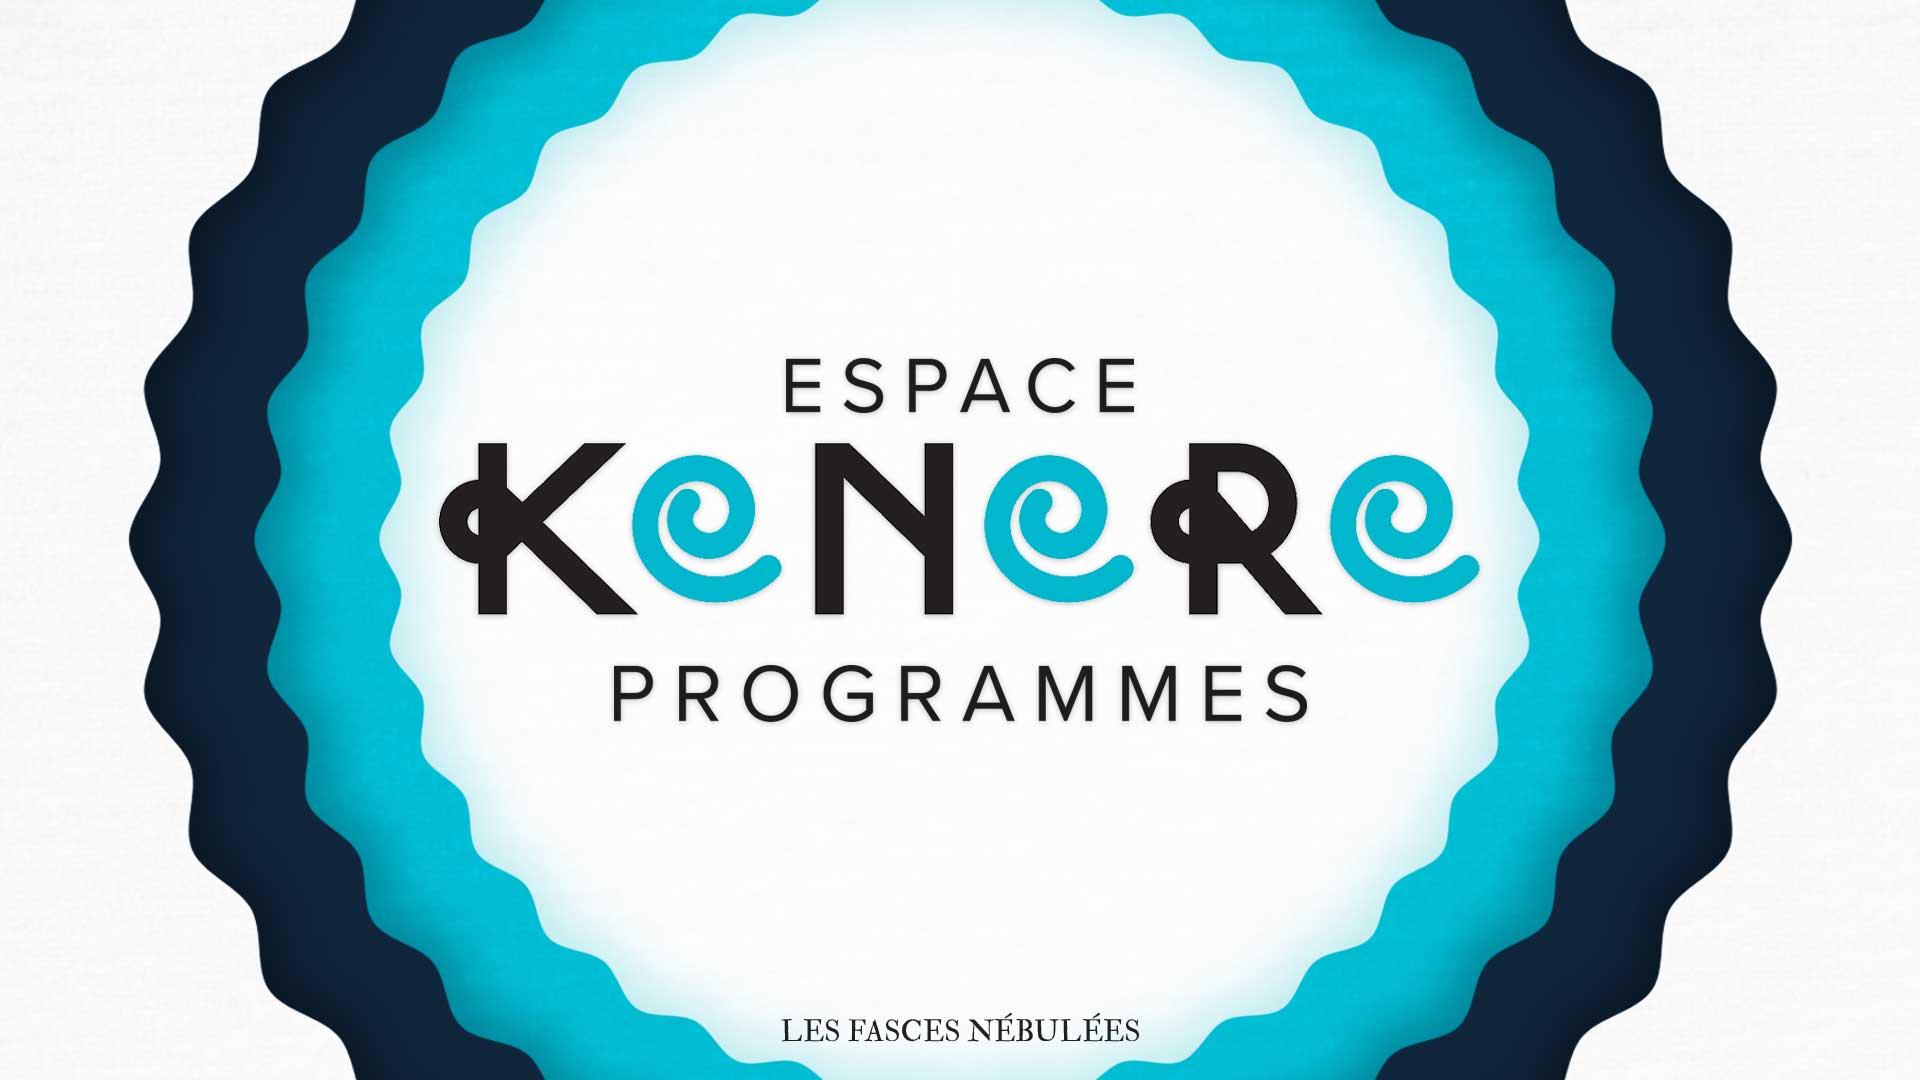 Espace Kenere </br> Programmes